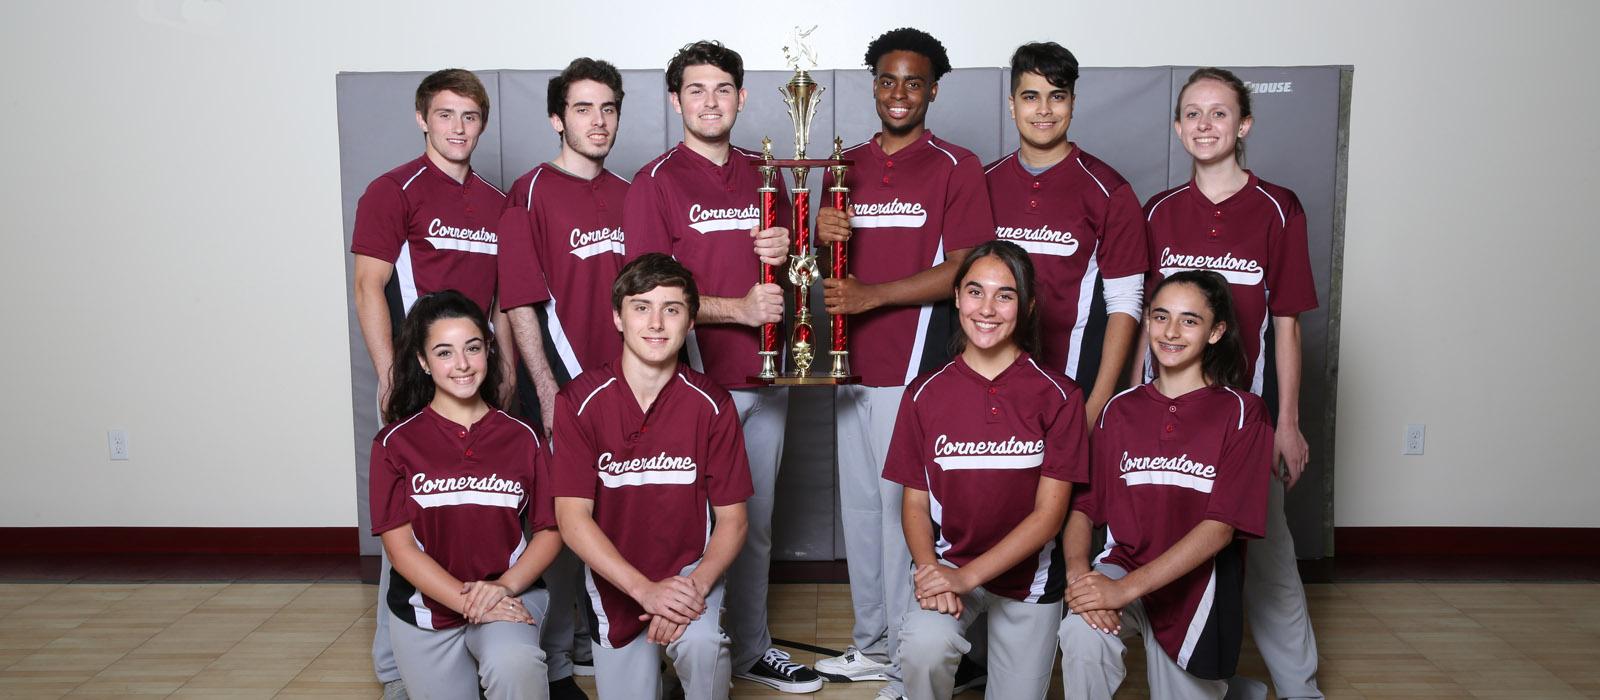 Cornerstone winning team